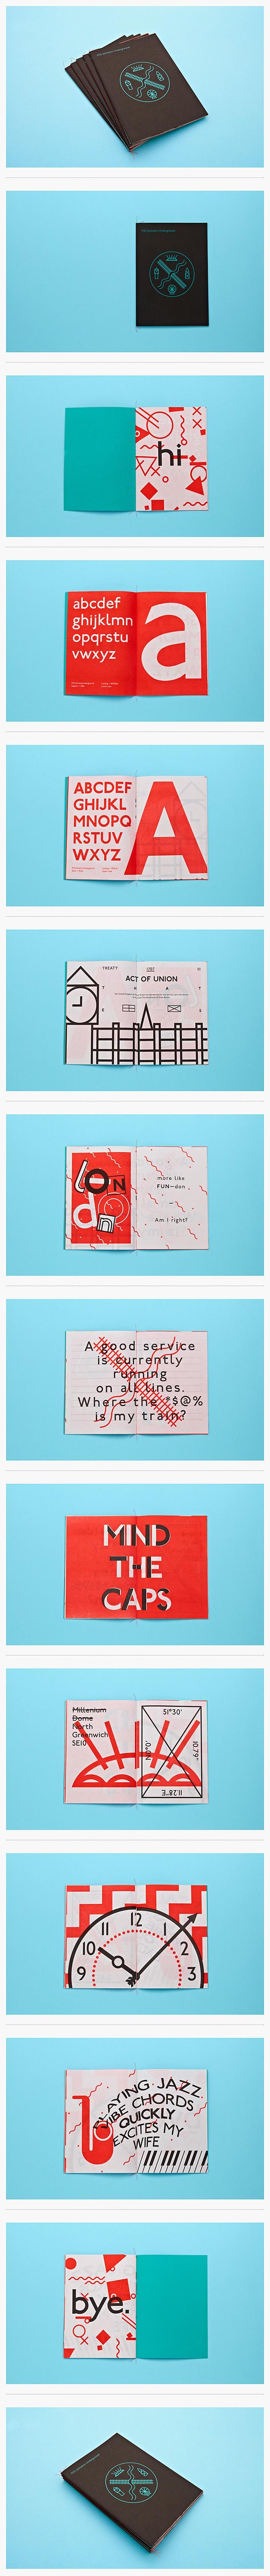 30 best Type design images on Pinterest | Bookbinding, Farmers ...